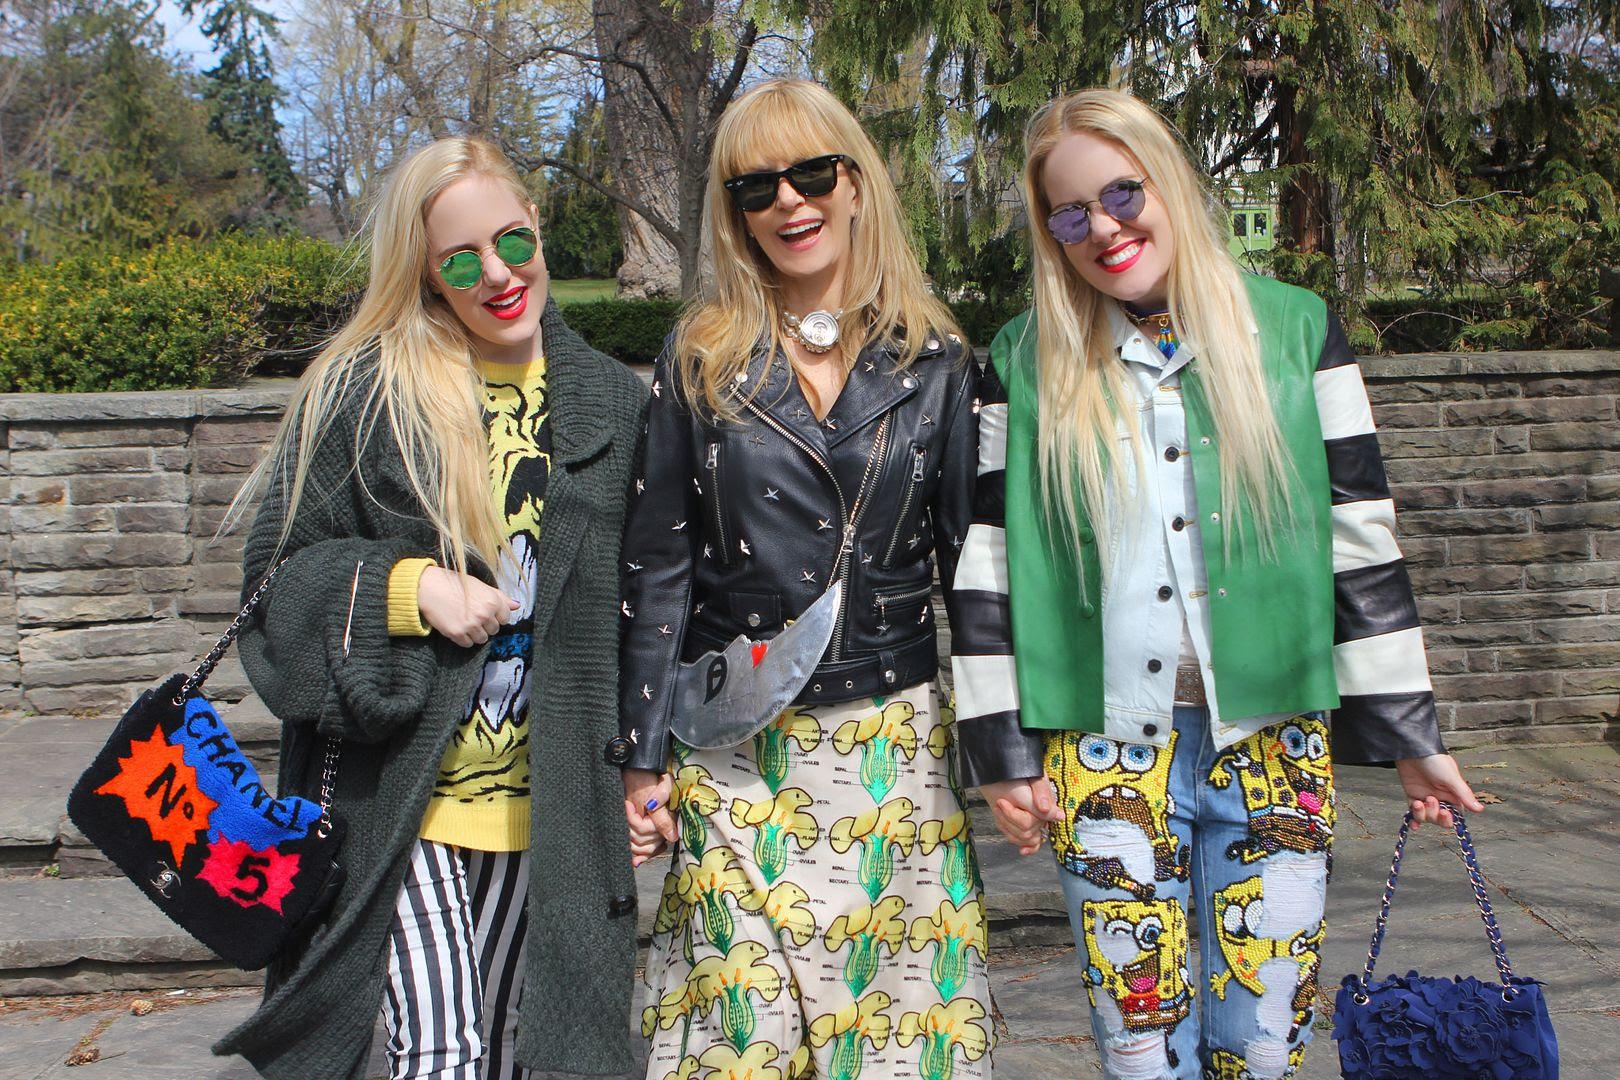 photo spongebobjeans-acneleatherjacket-chanelbags-raybansunglasses-sunglasshut-beckermangirls-sisters-twins-canadastreetstyle-toro_zpsgde7gz0v.jpg